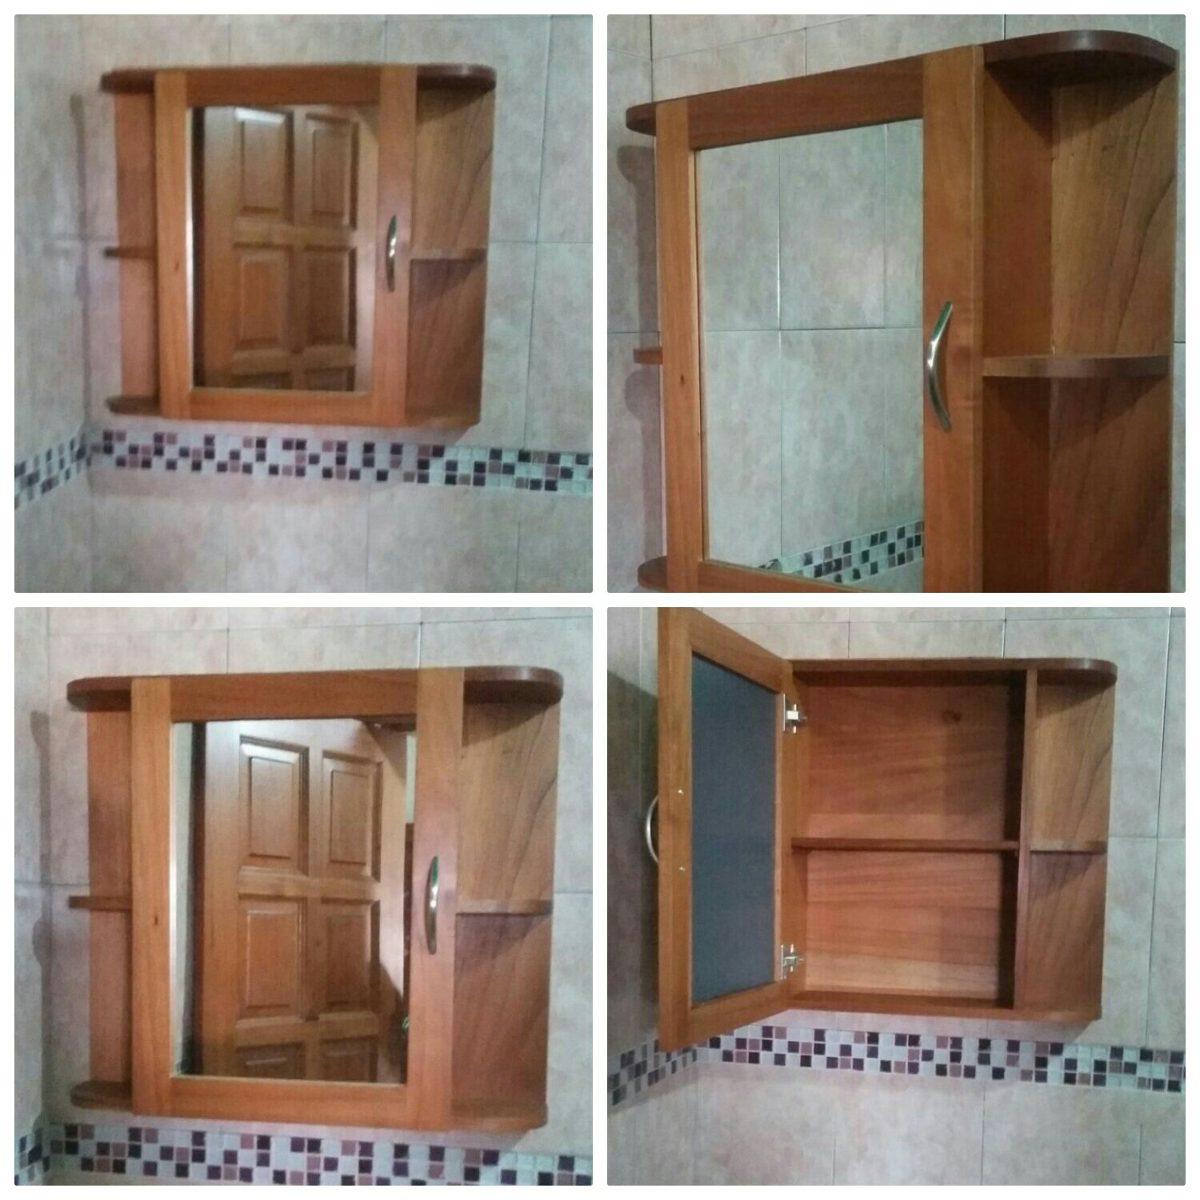 Cocinas empotradas closets muebles de ba os puertas for Muebles gundin sada